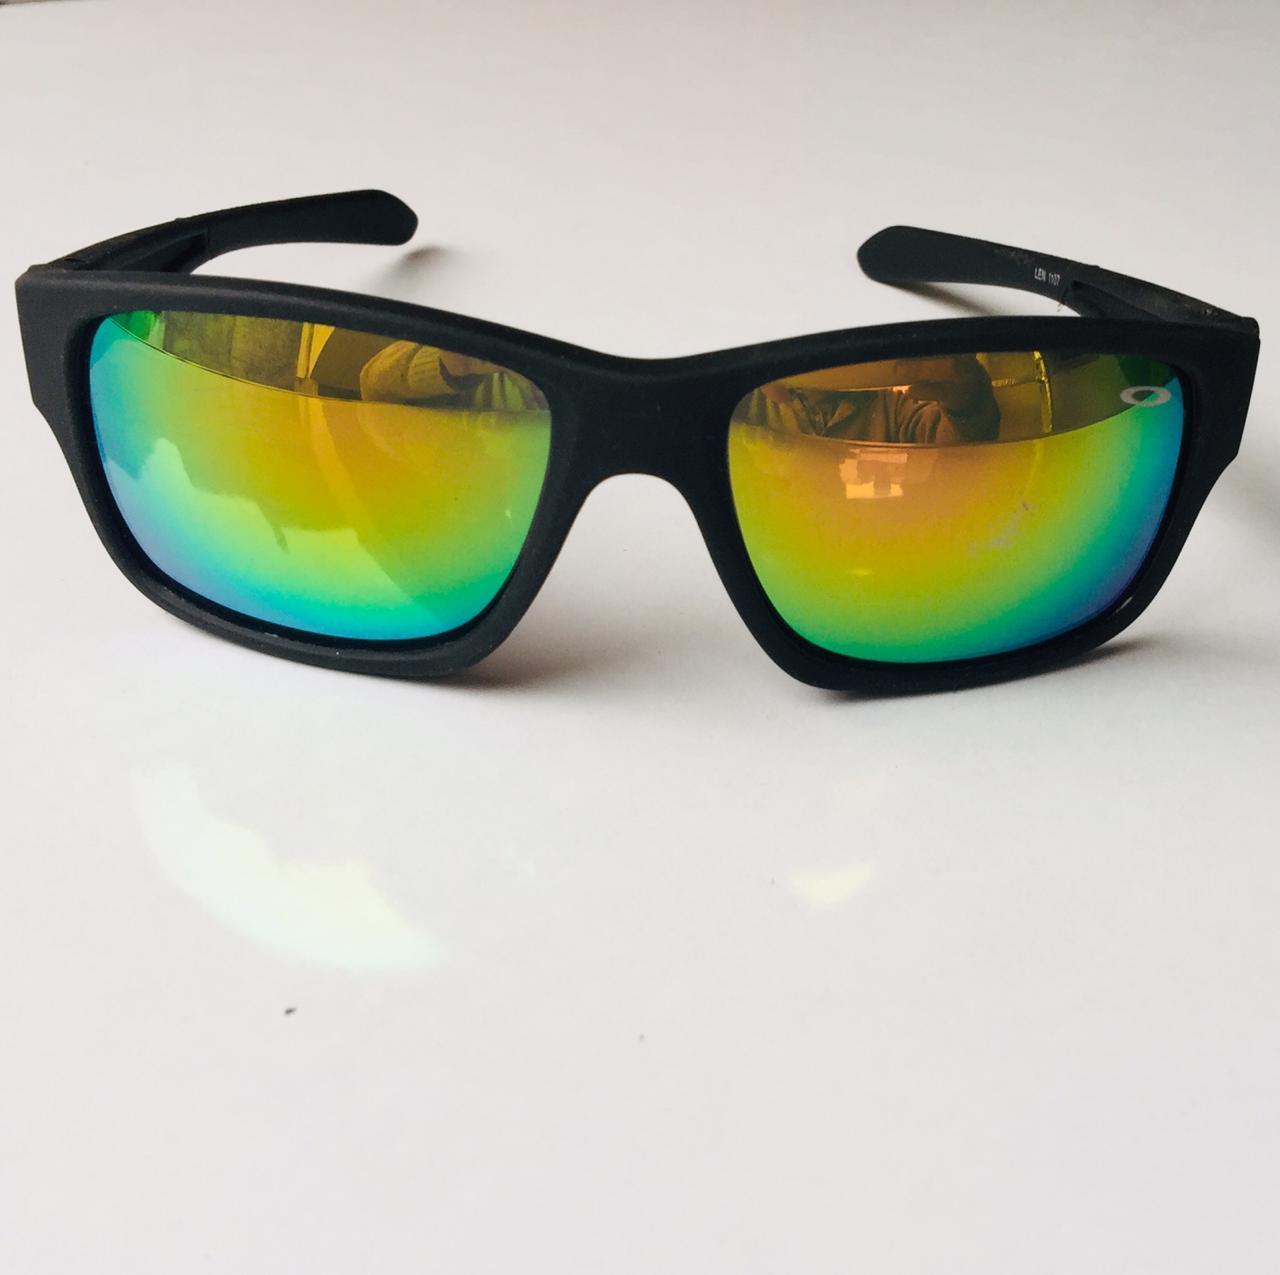 8c7bf2adf1f 2019 new Unisex Reflective vintage sunglasses men Brand designer fashion  sun glasses